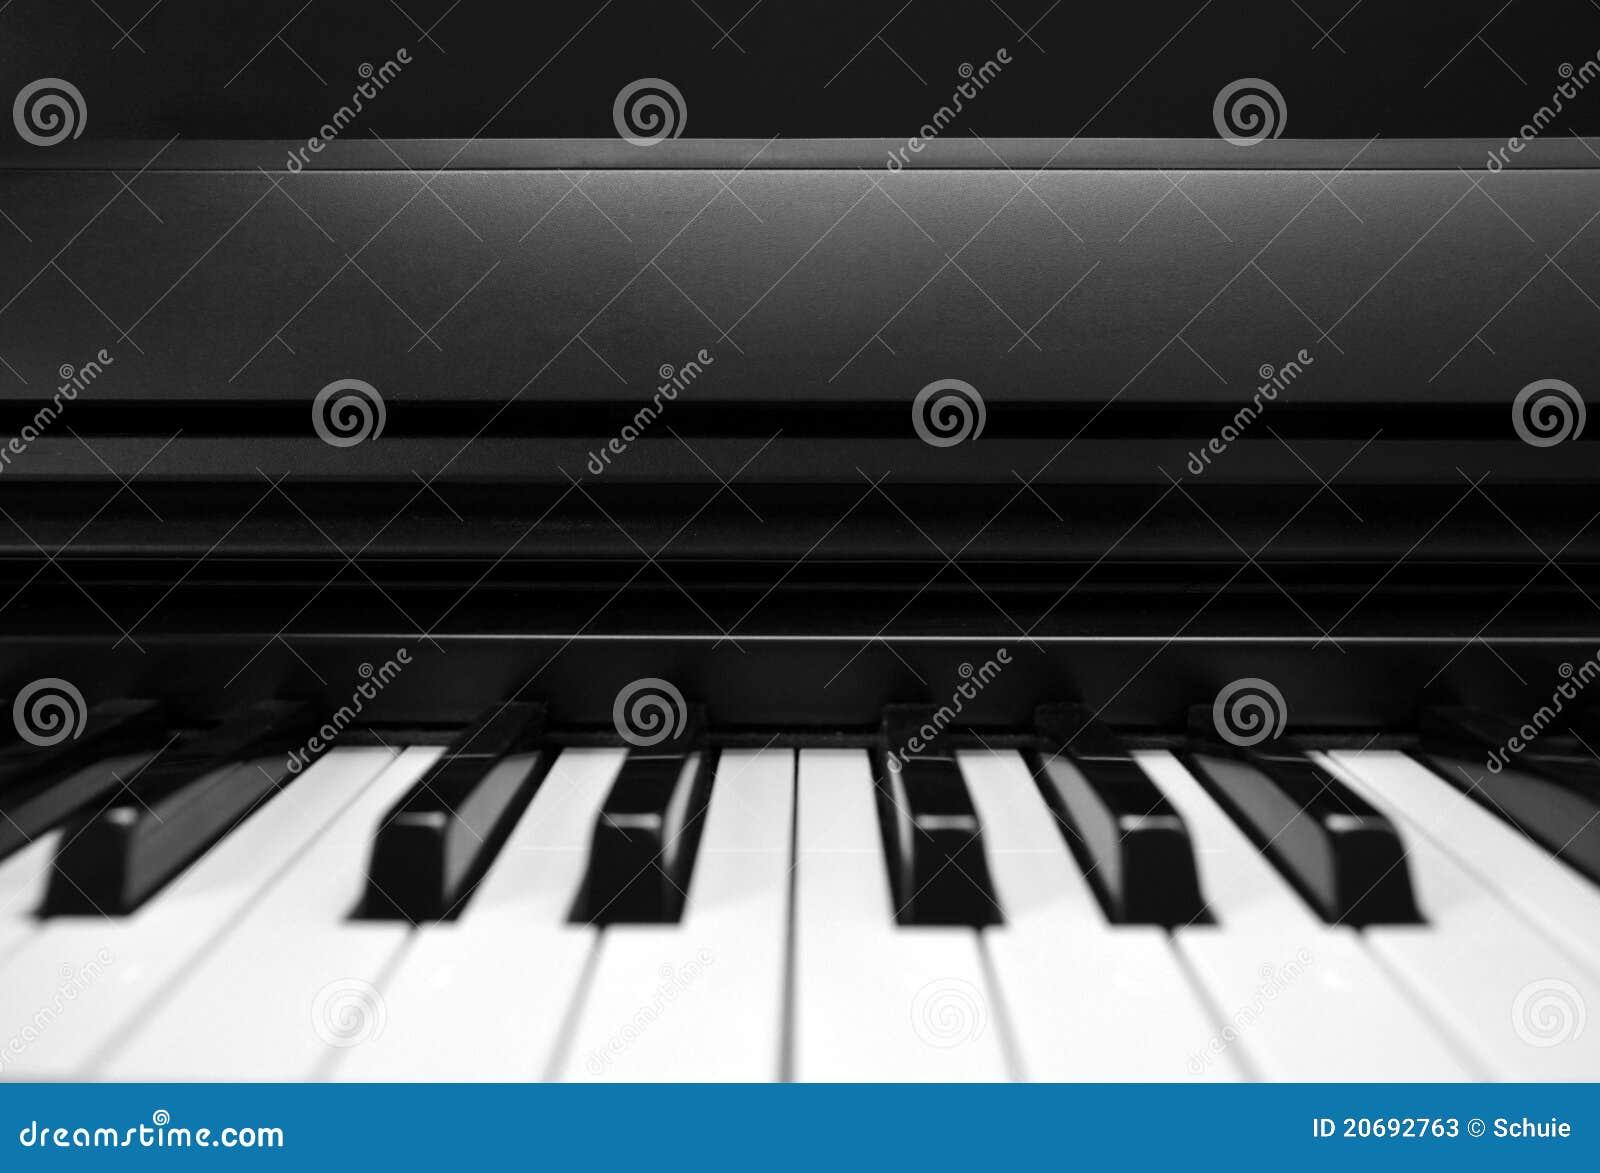 The Black (and White) Keys